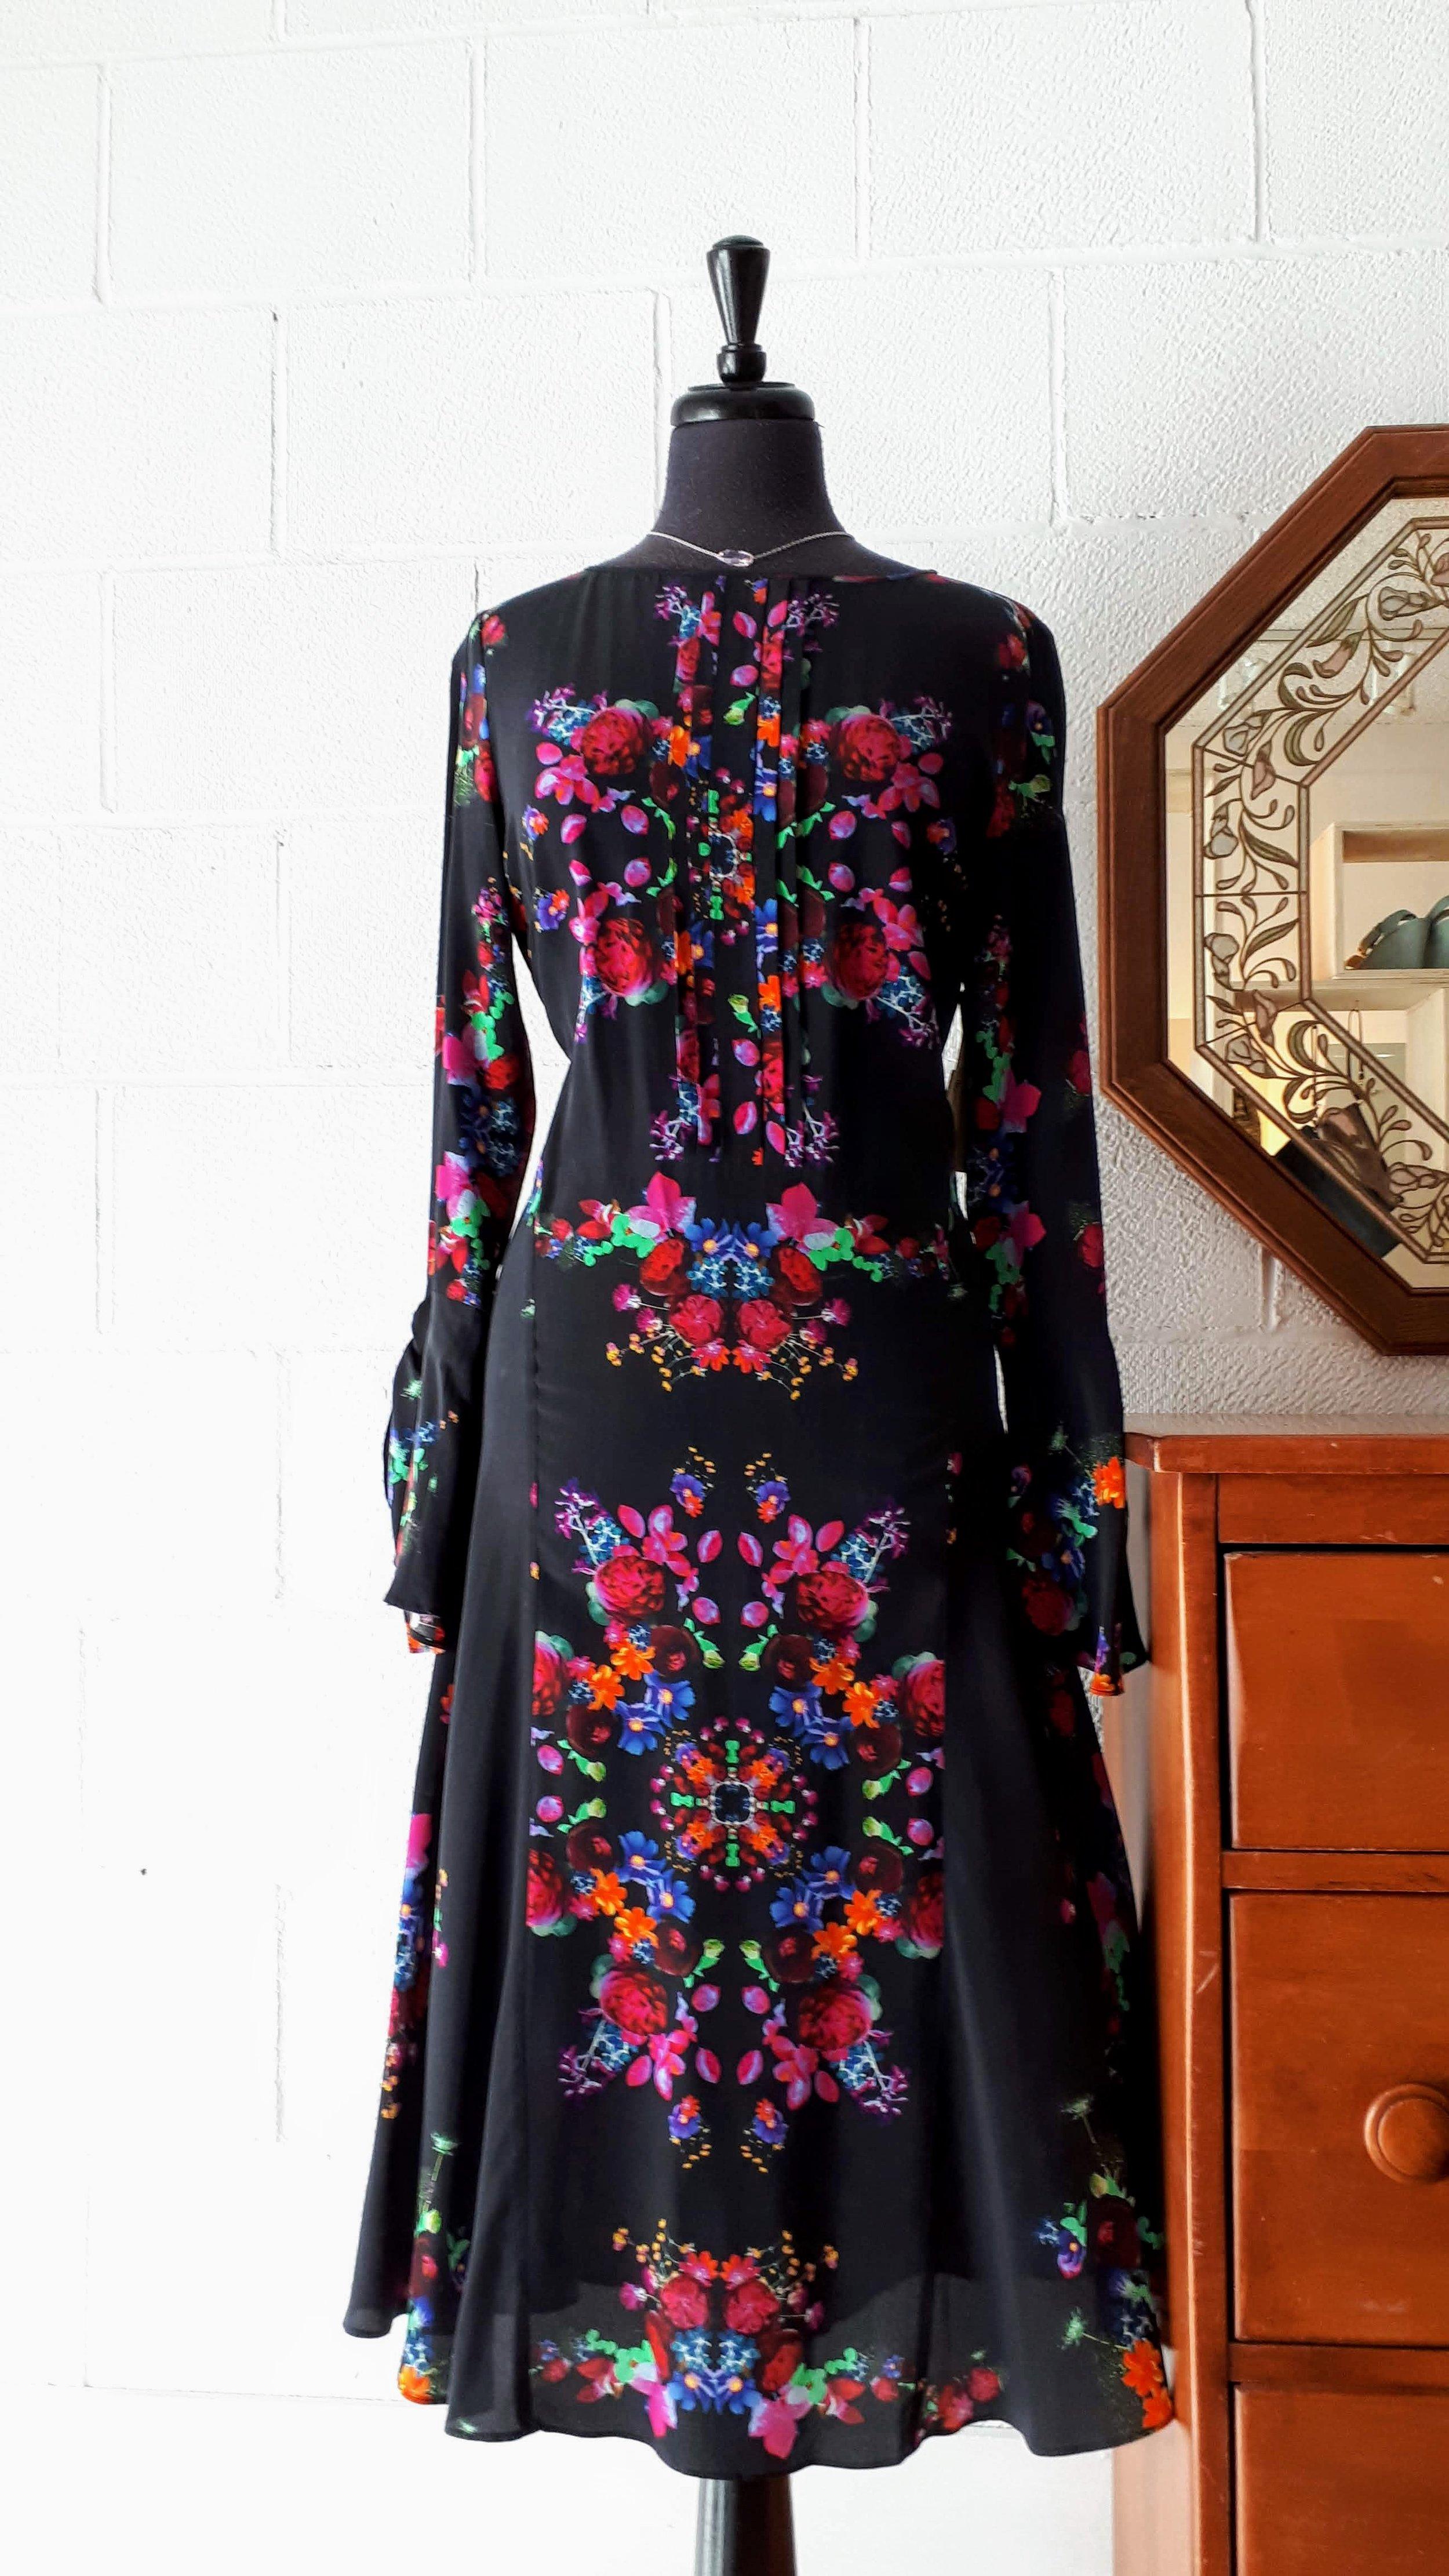 Nicole Miller dress (NWT); Size M, $165